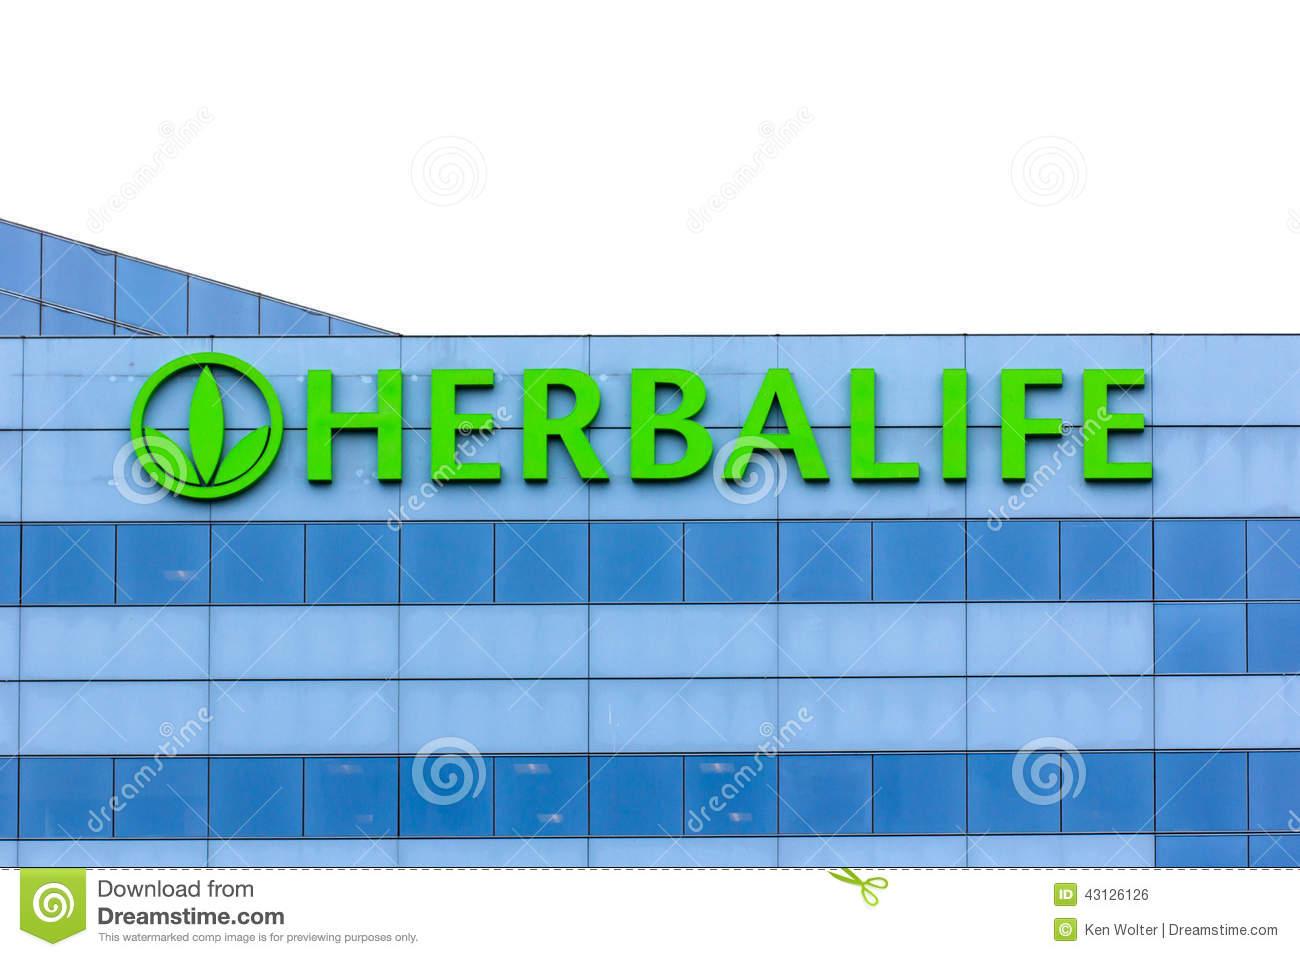 Herbalife-  Pyramid Scheme vs MLM